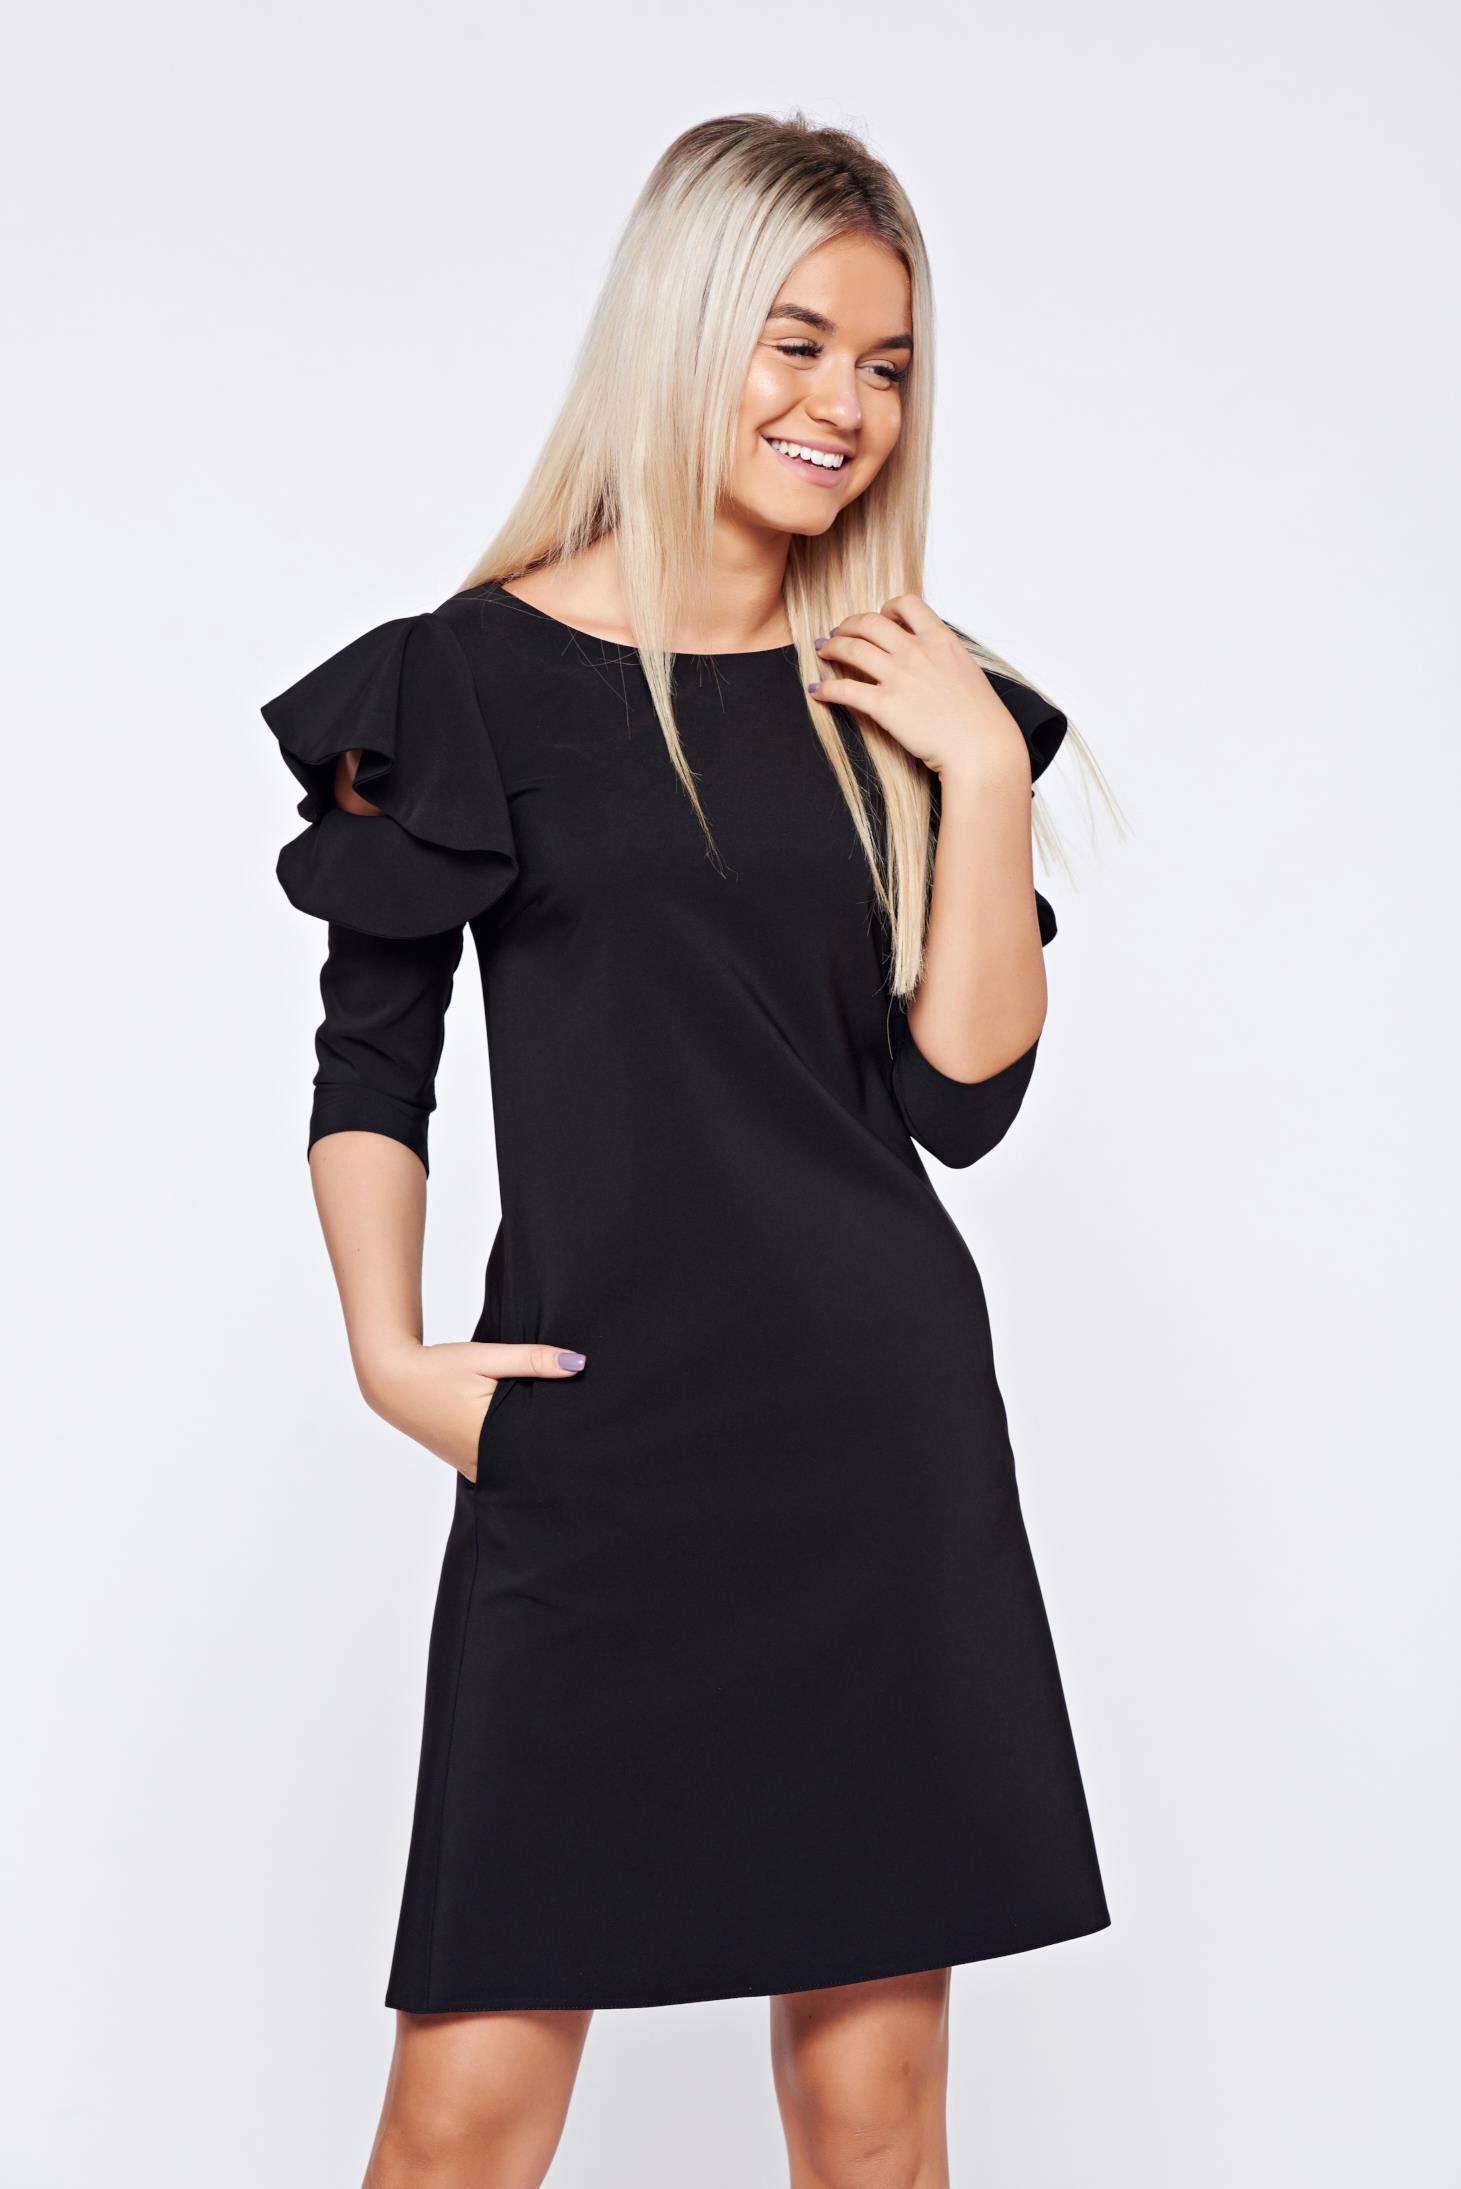 Rochie LaDonna neagra cu croi larg din stofa usor elastica cu volanase la maneca